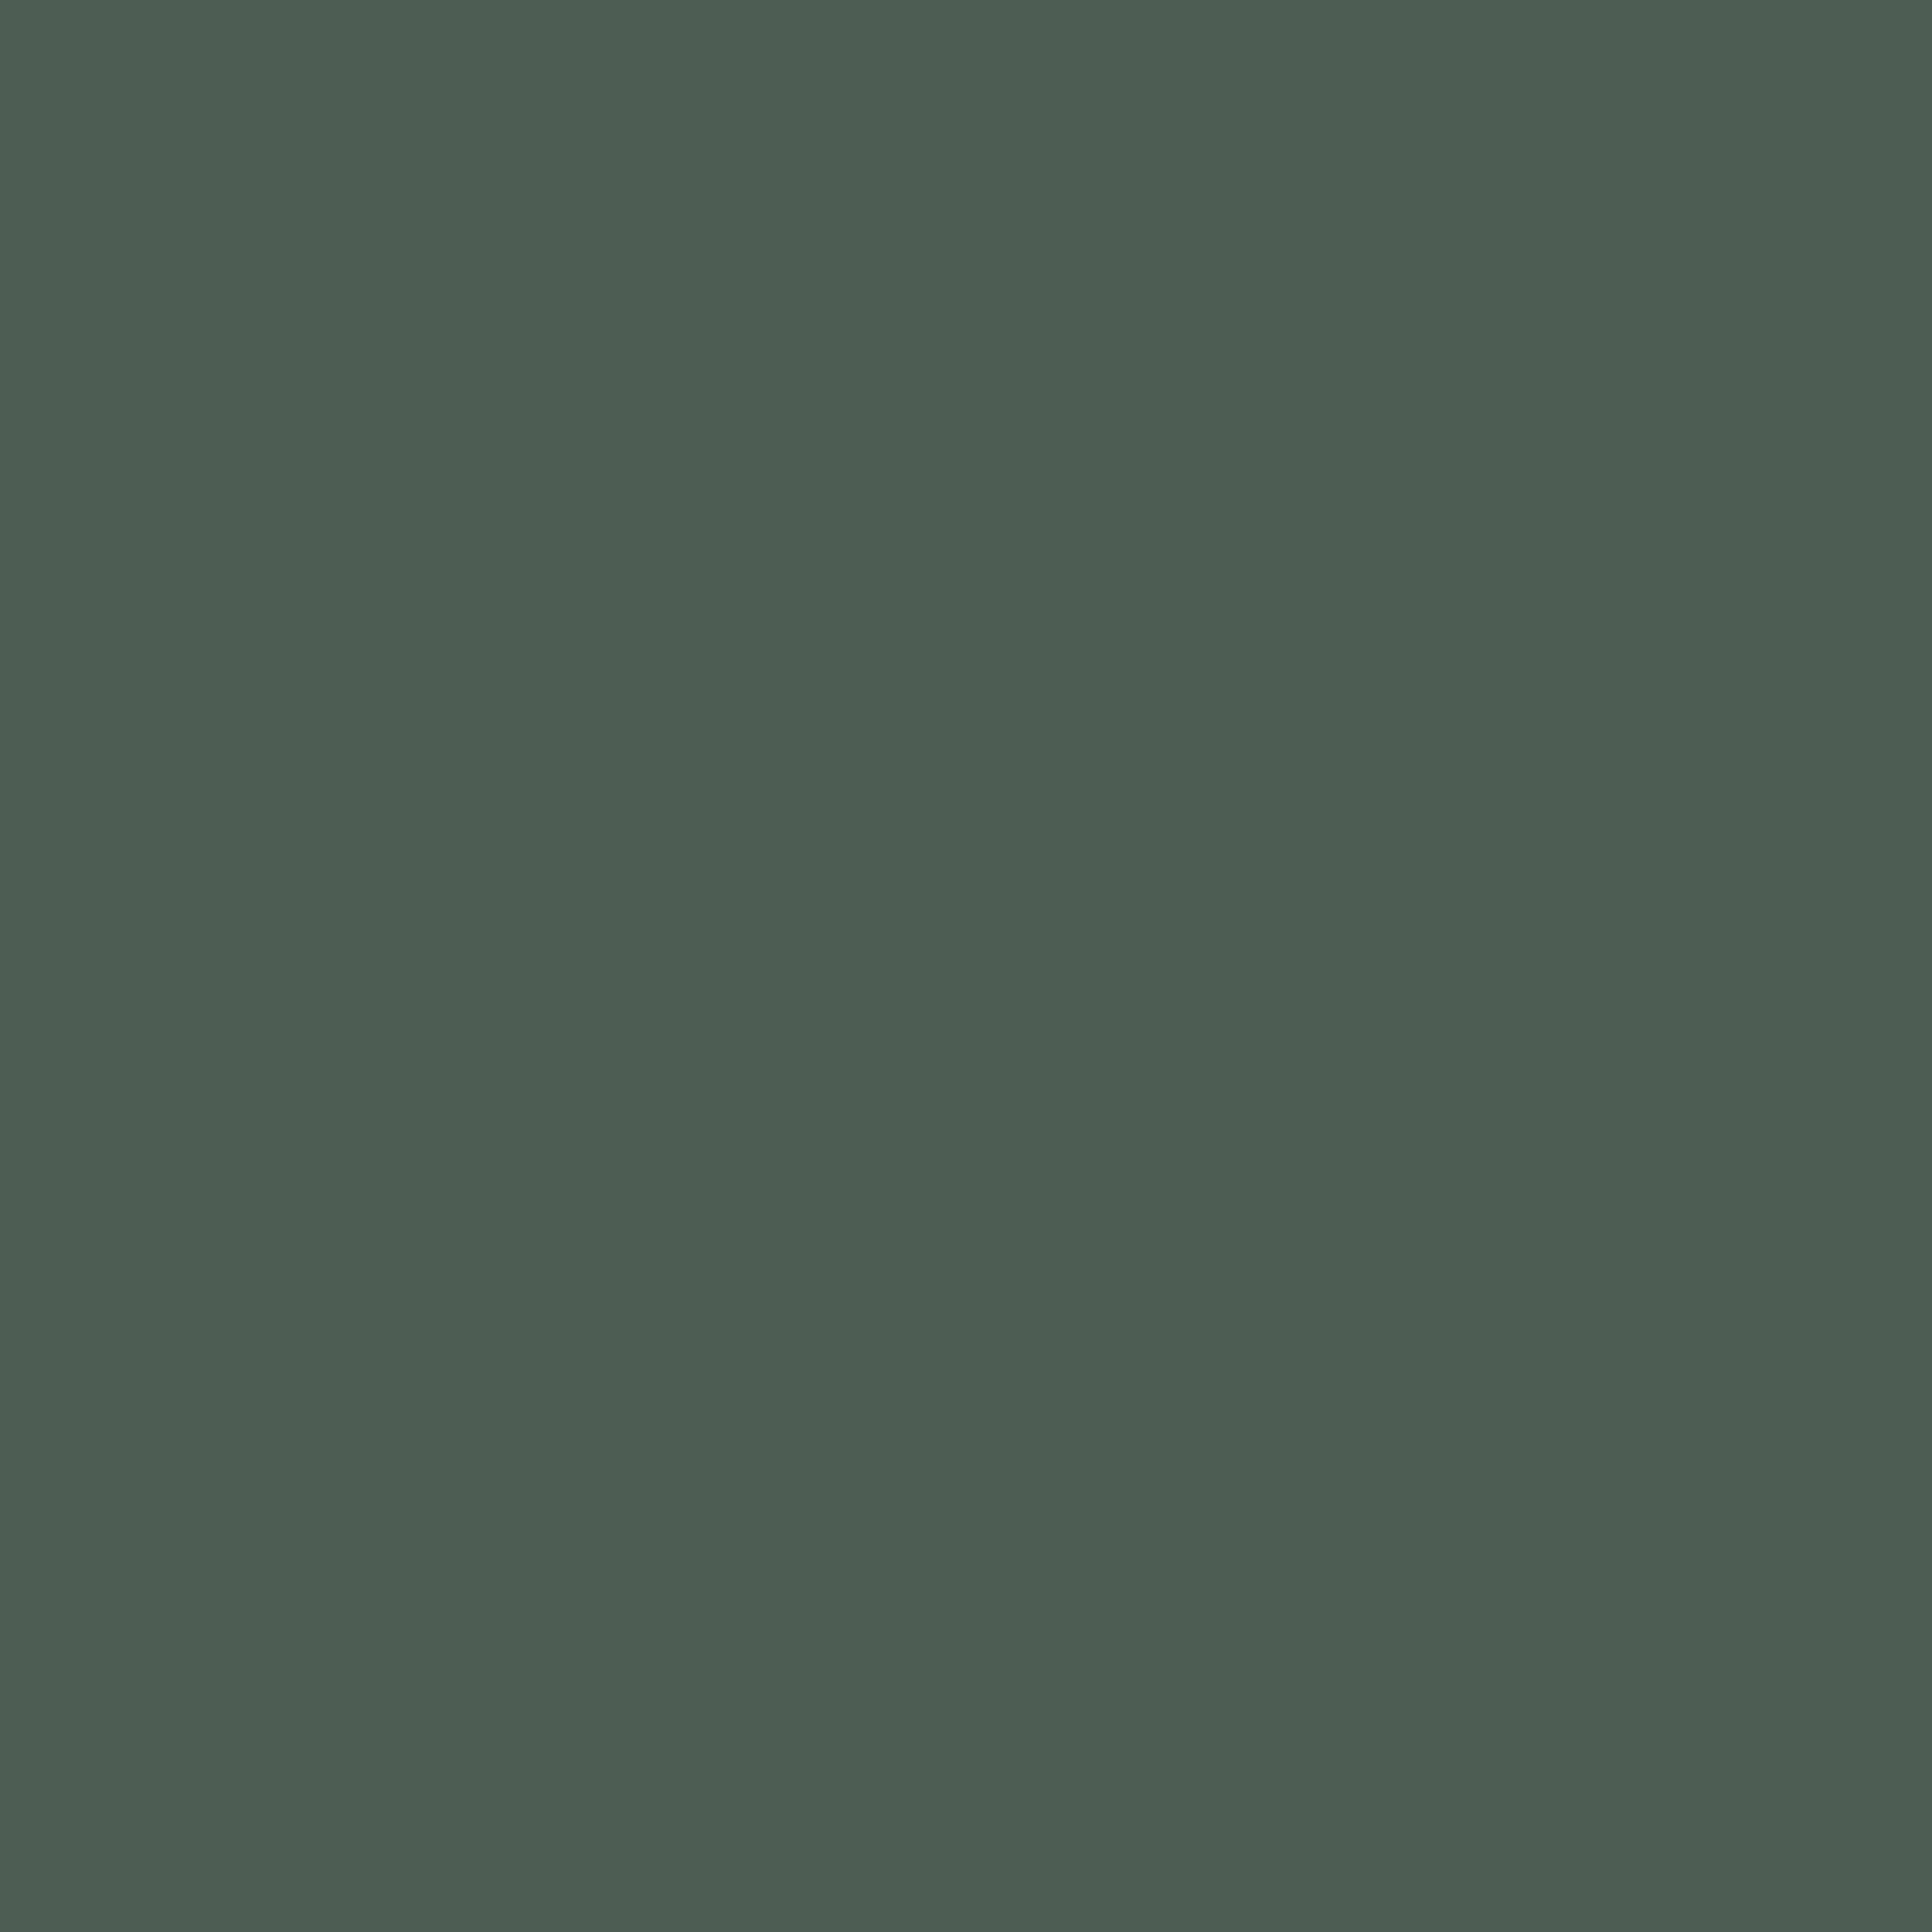 3600x3600 Feldgrau Solid Color Background